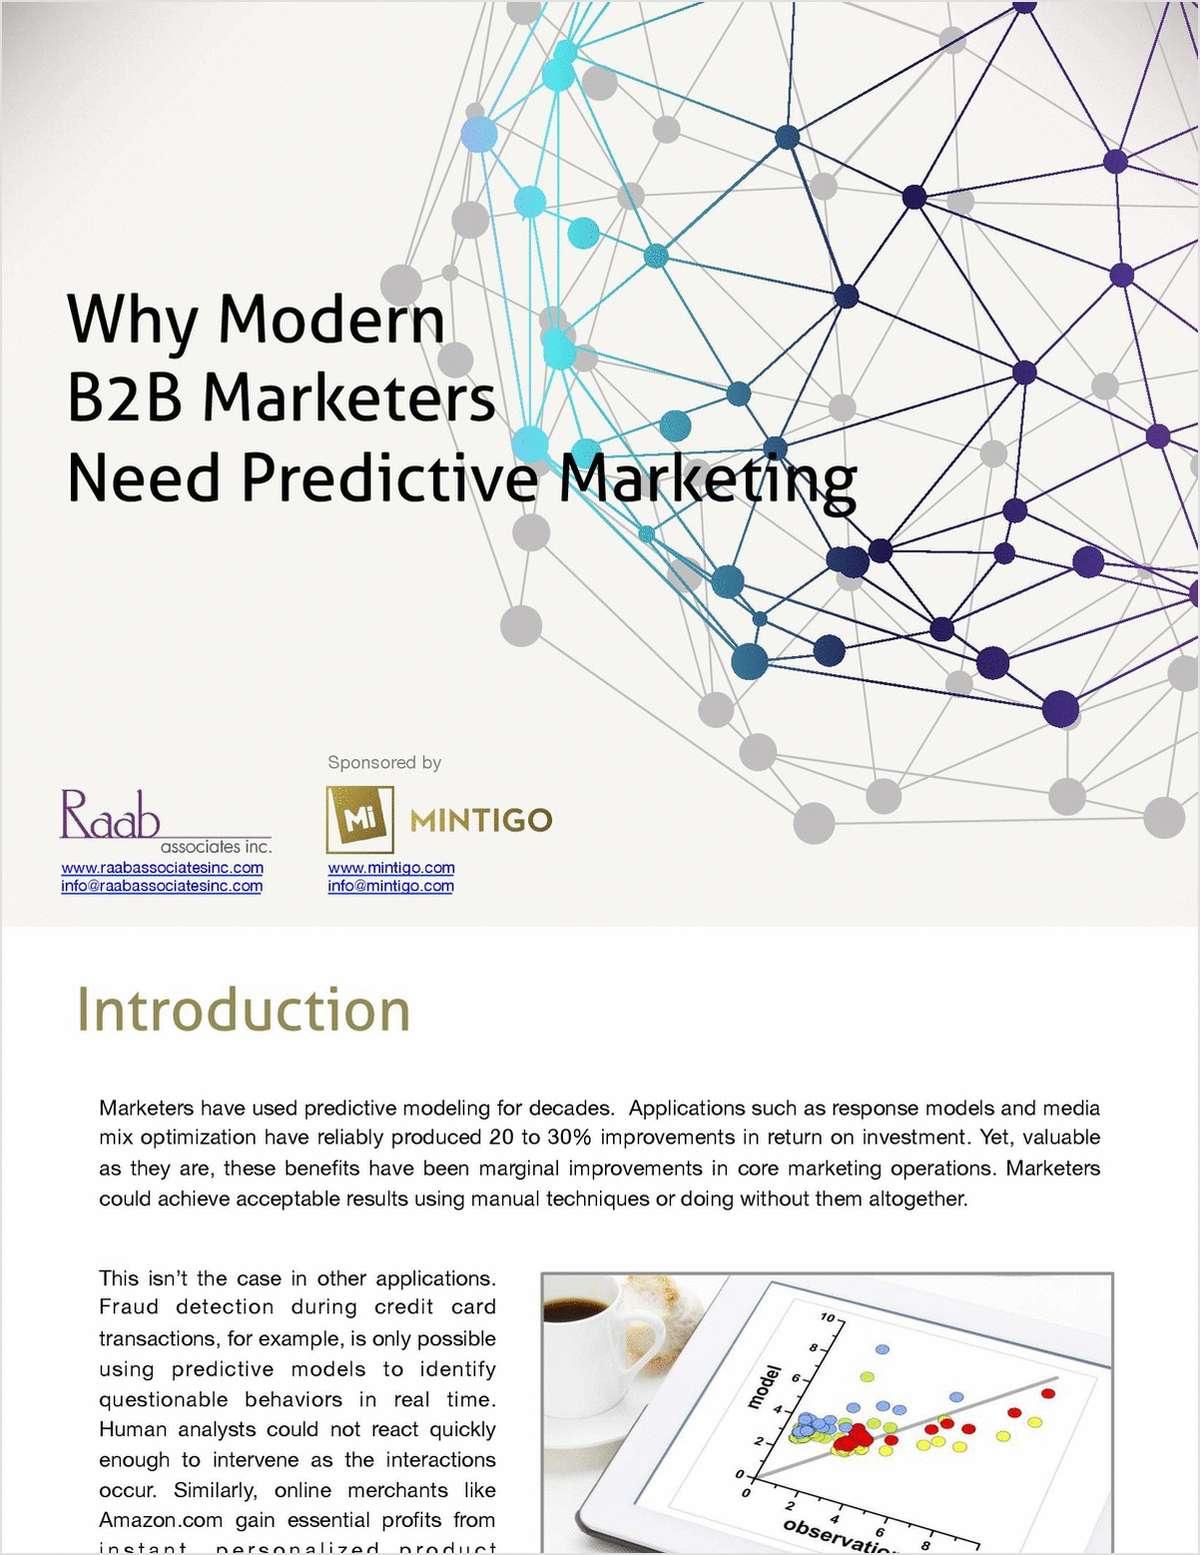 Why Modern B2B Marketers Need Predictive Marketing